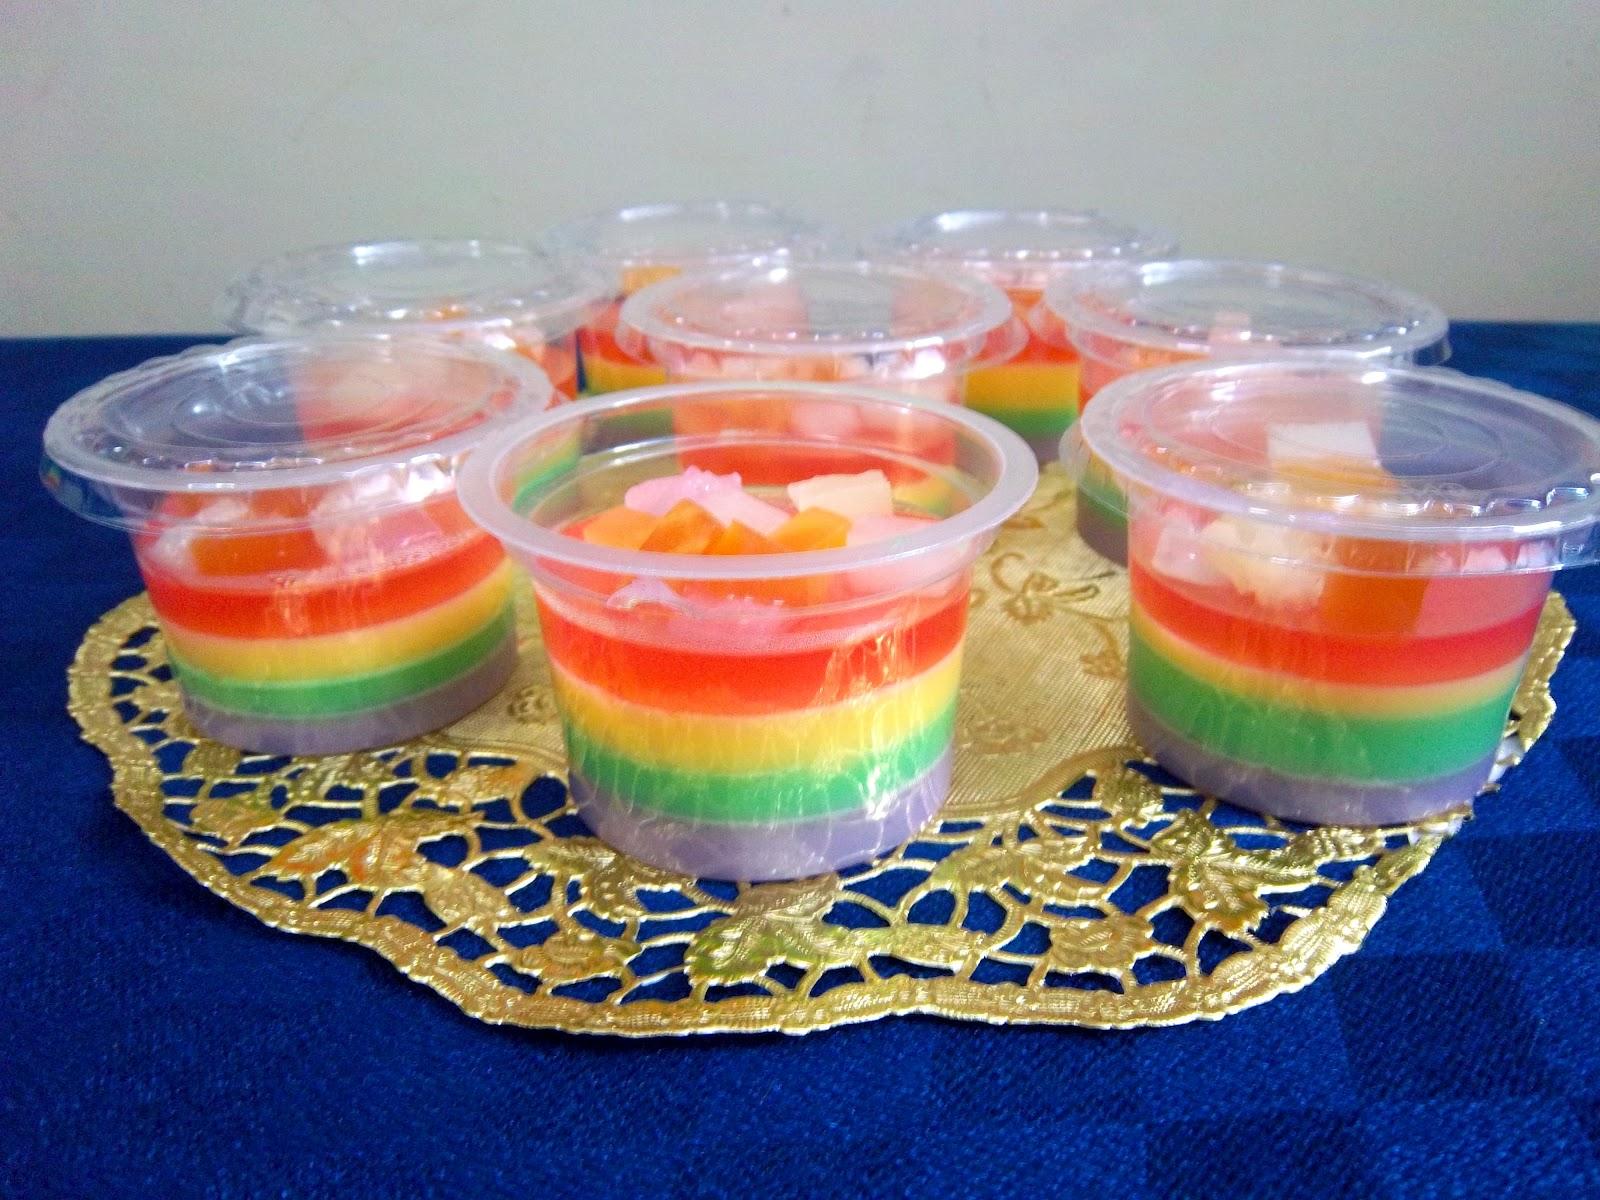 DAPUR CANTIQ : Tak jadi Rainbow CakeRainbow Pudding pun jadi